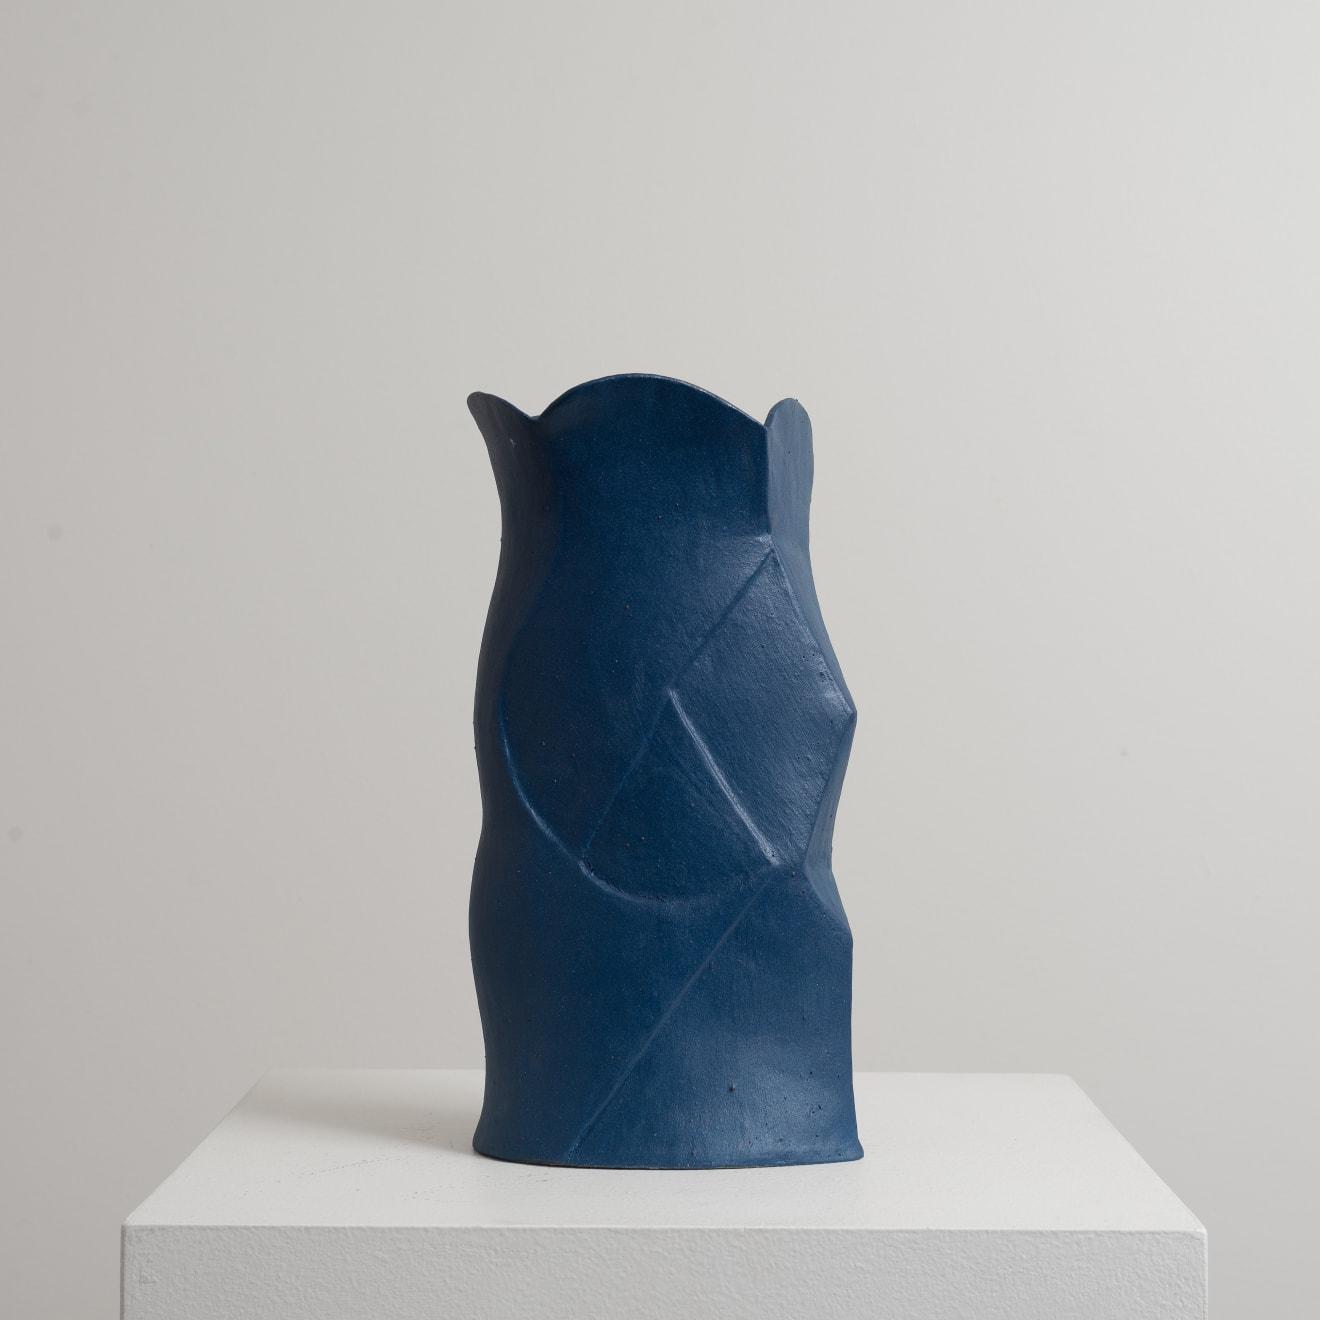 Bettina Willner-Browne Diamond and Ellipse Hand-Built, Stoneware, Glaze Original 28.5 x 14.5 x 9 cm $950 £475